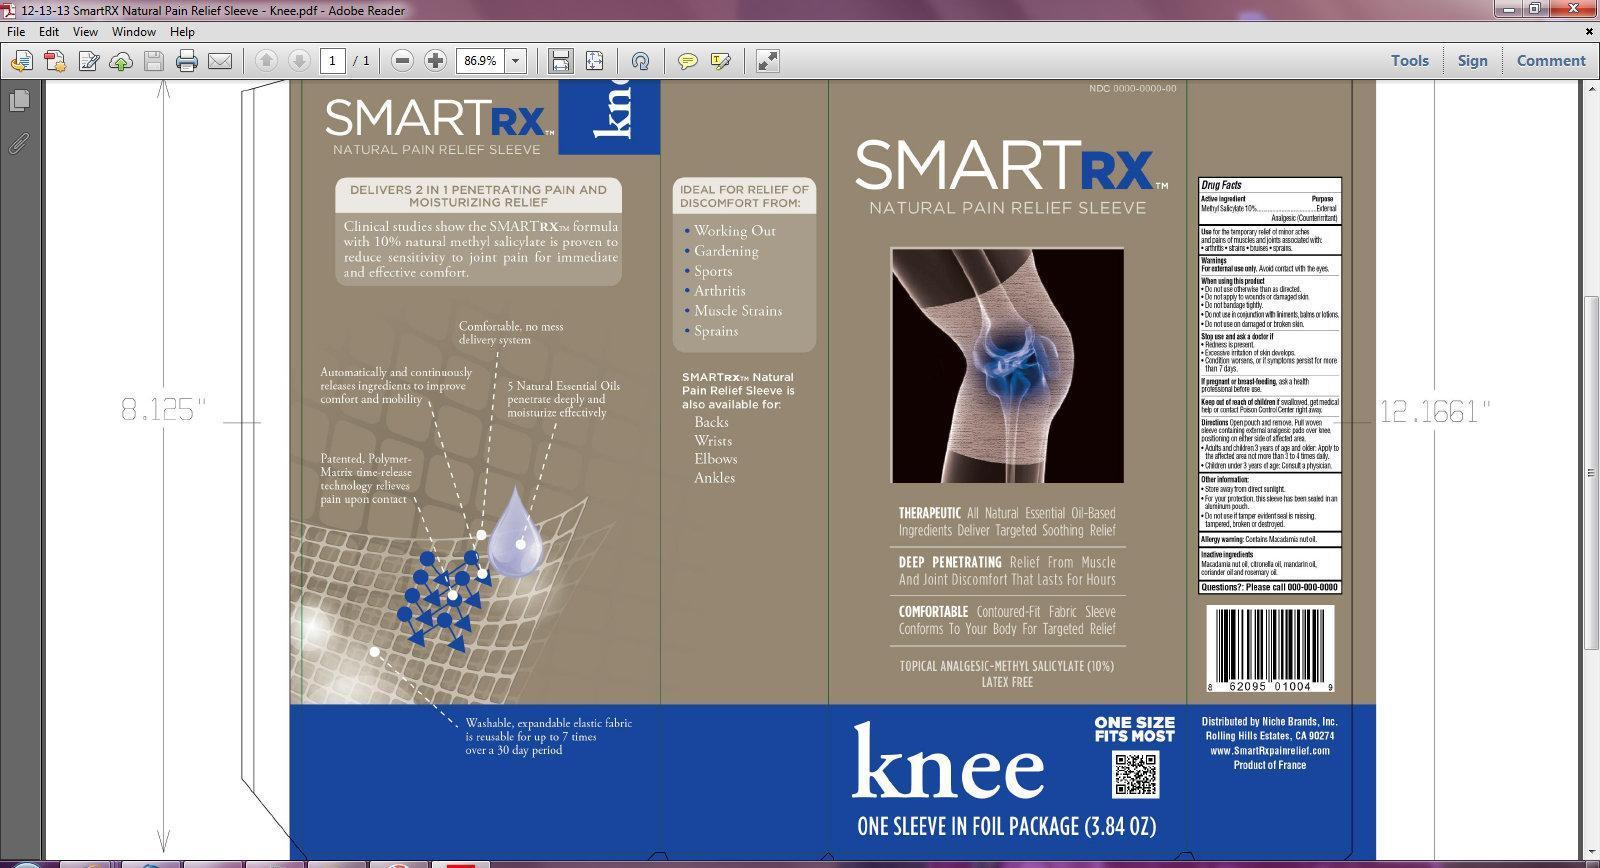 Smartrx Natural Pain Relief Sleeve Knee (Methyl Salicylate) Liquid [Niche Brands, Inc.]